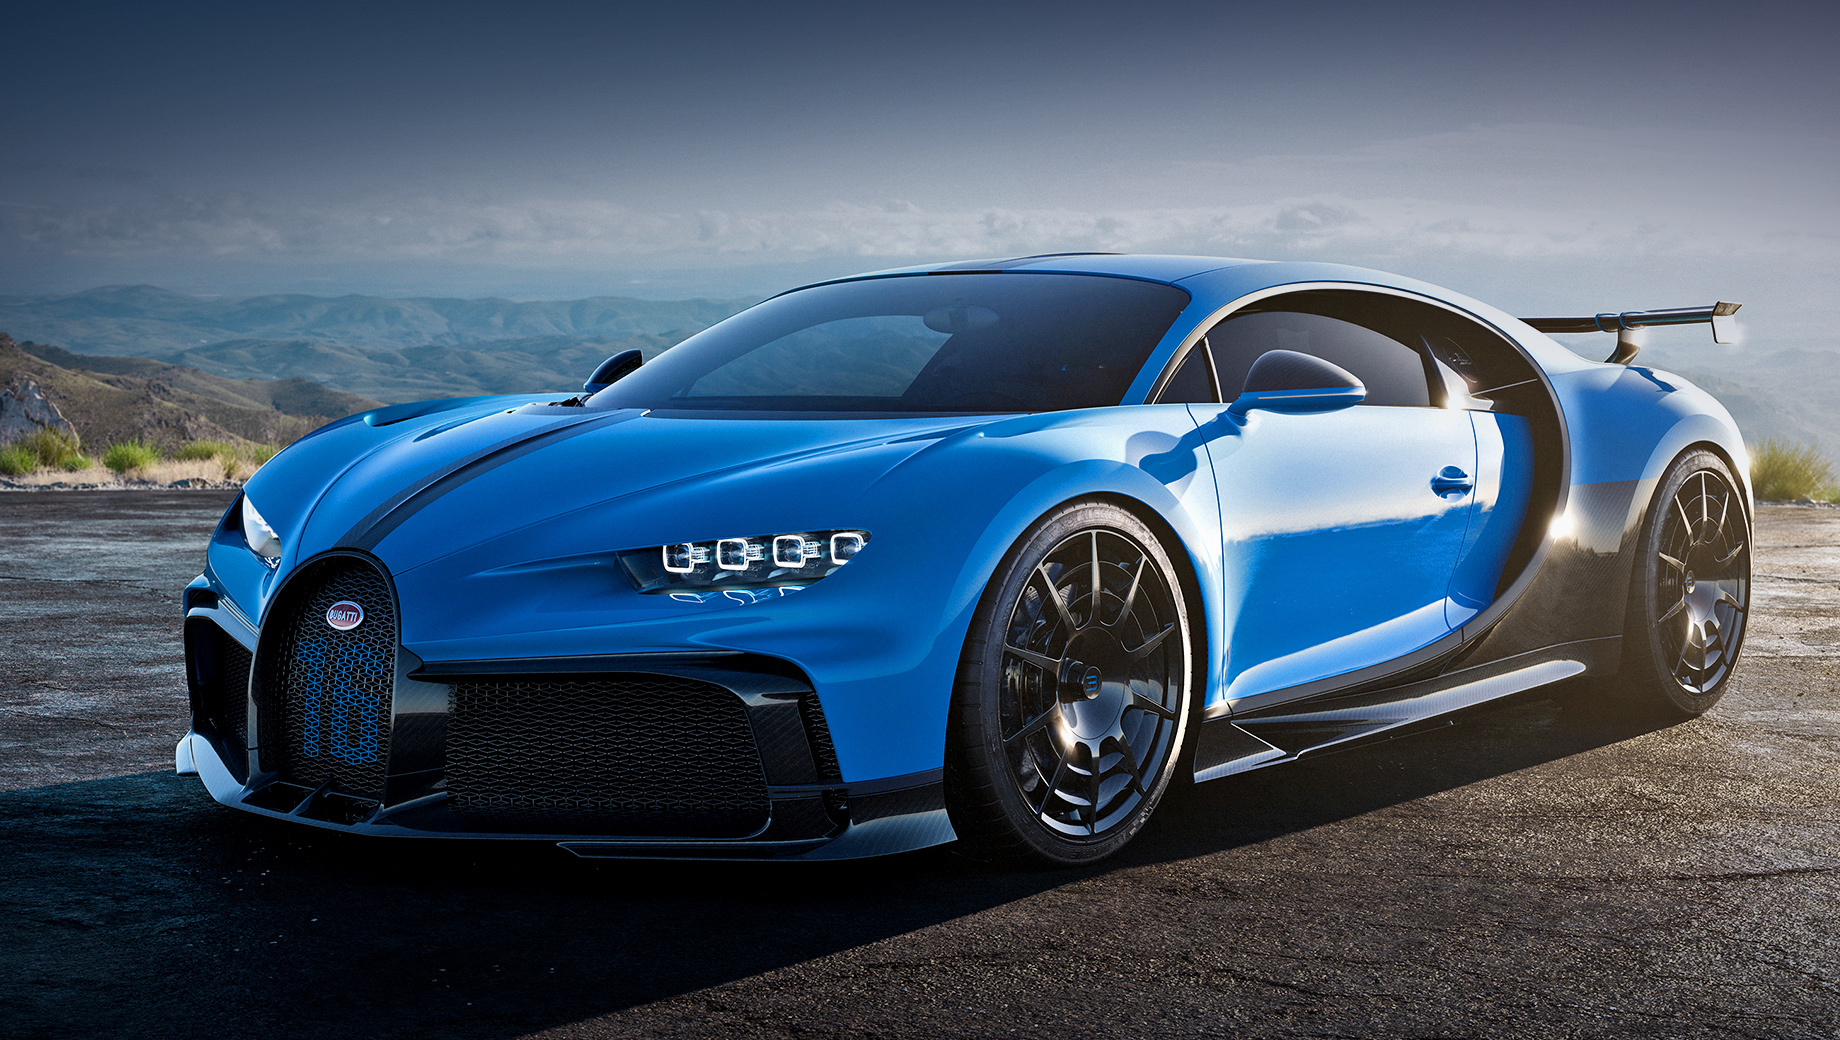 В гиперкарах Bugatti обнаружены дефекты